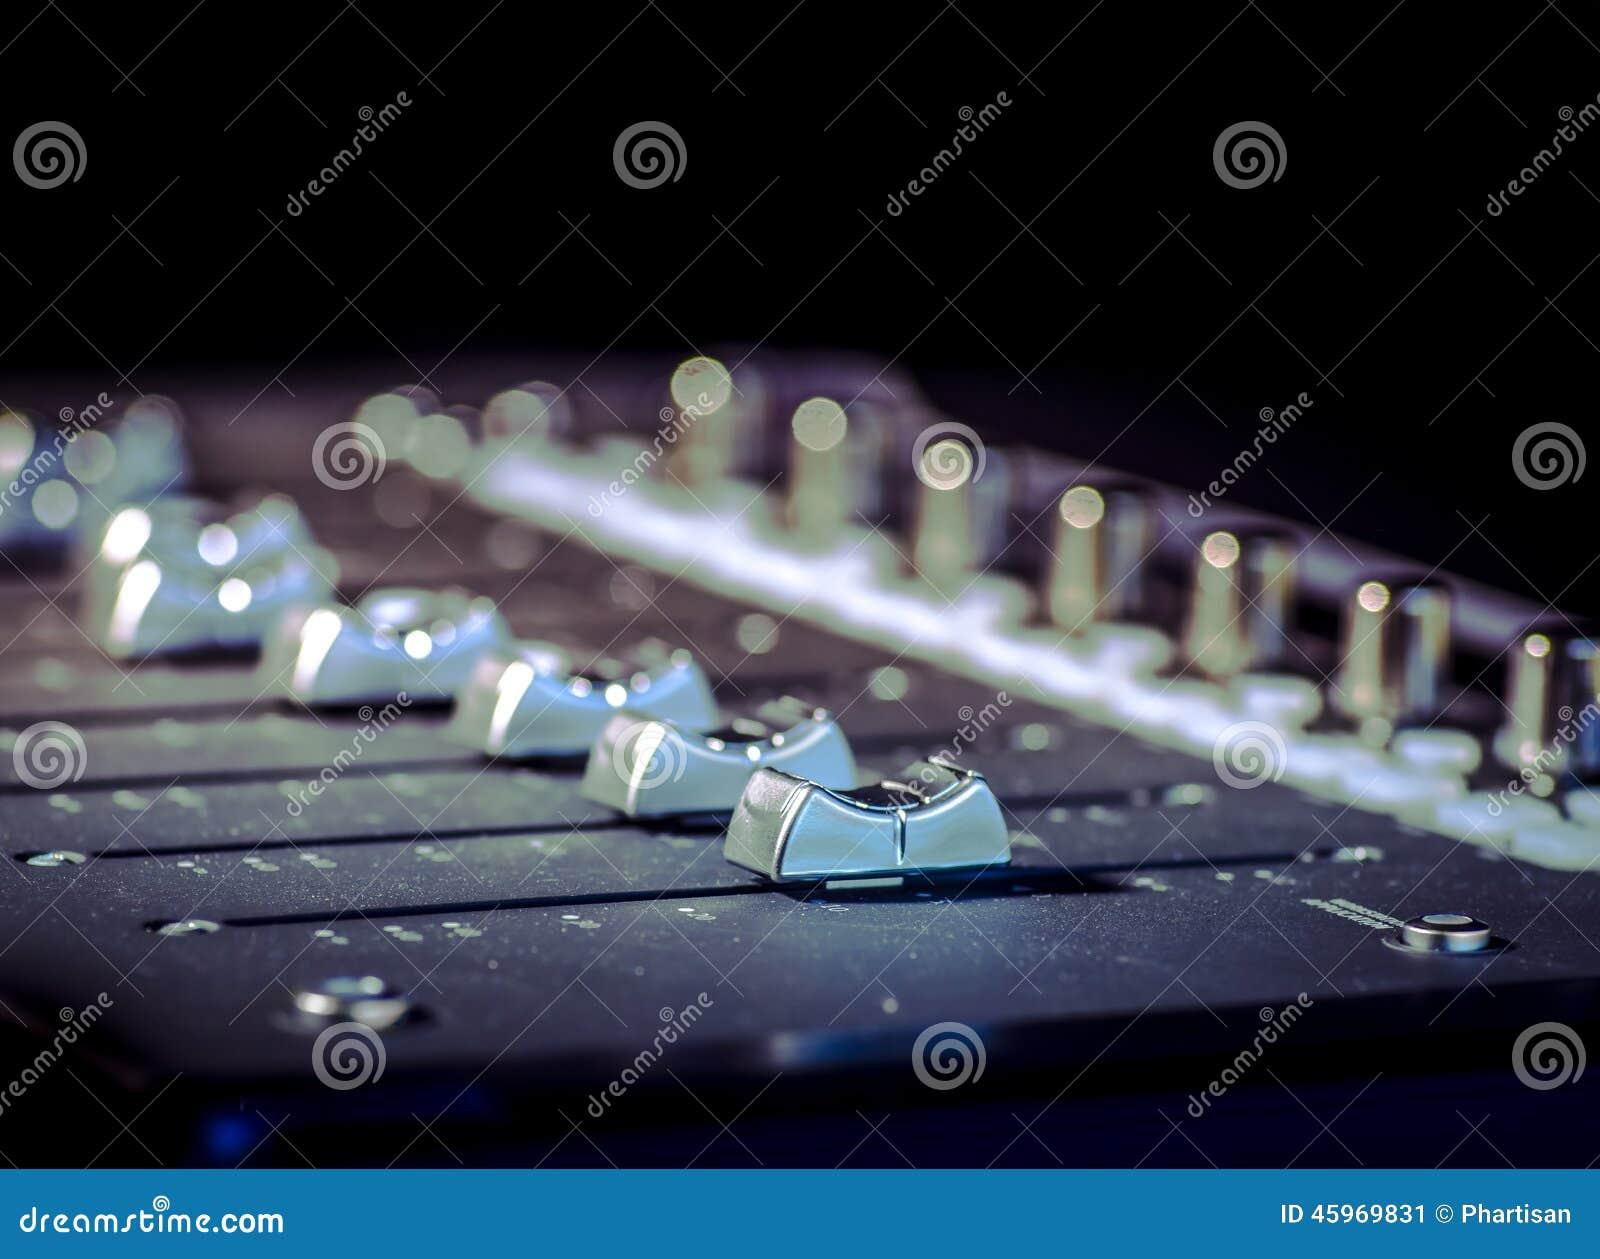 Recording music sound studio sliders